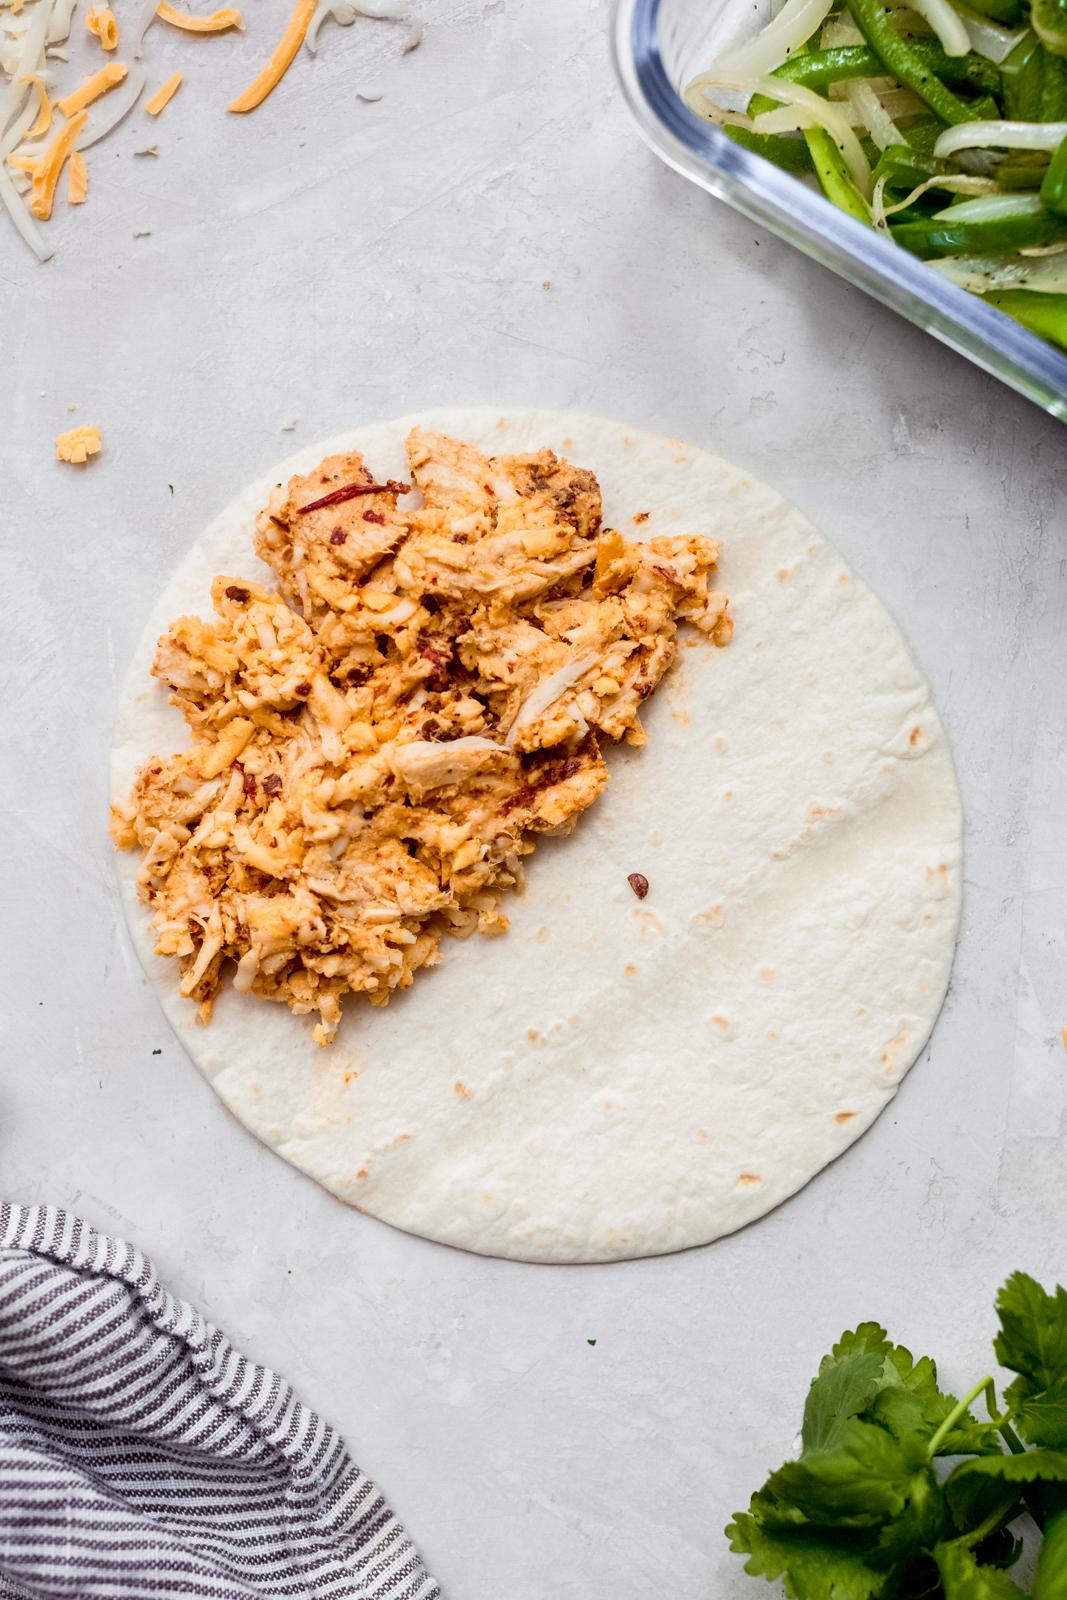 chicken quesadilla mixture on half of a tortilla